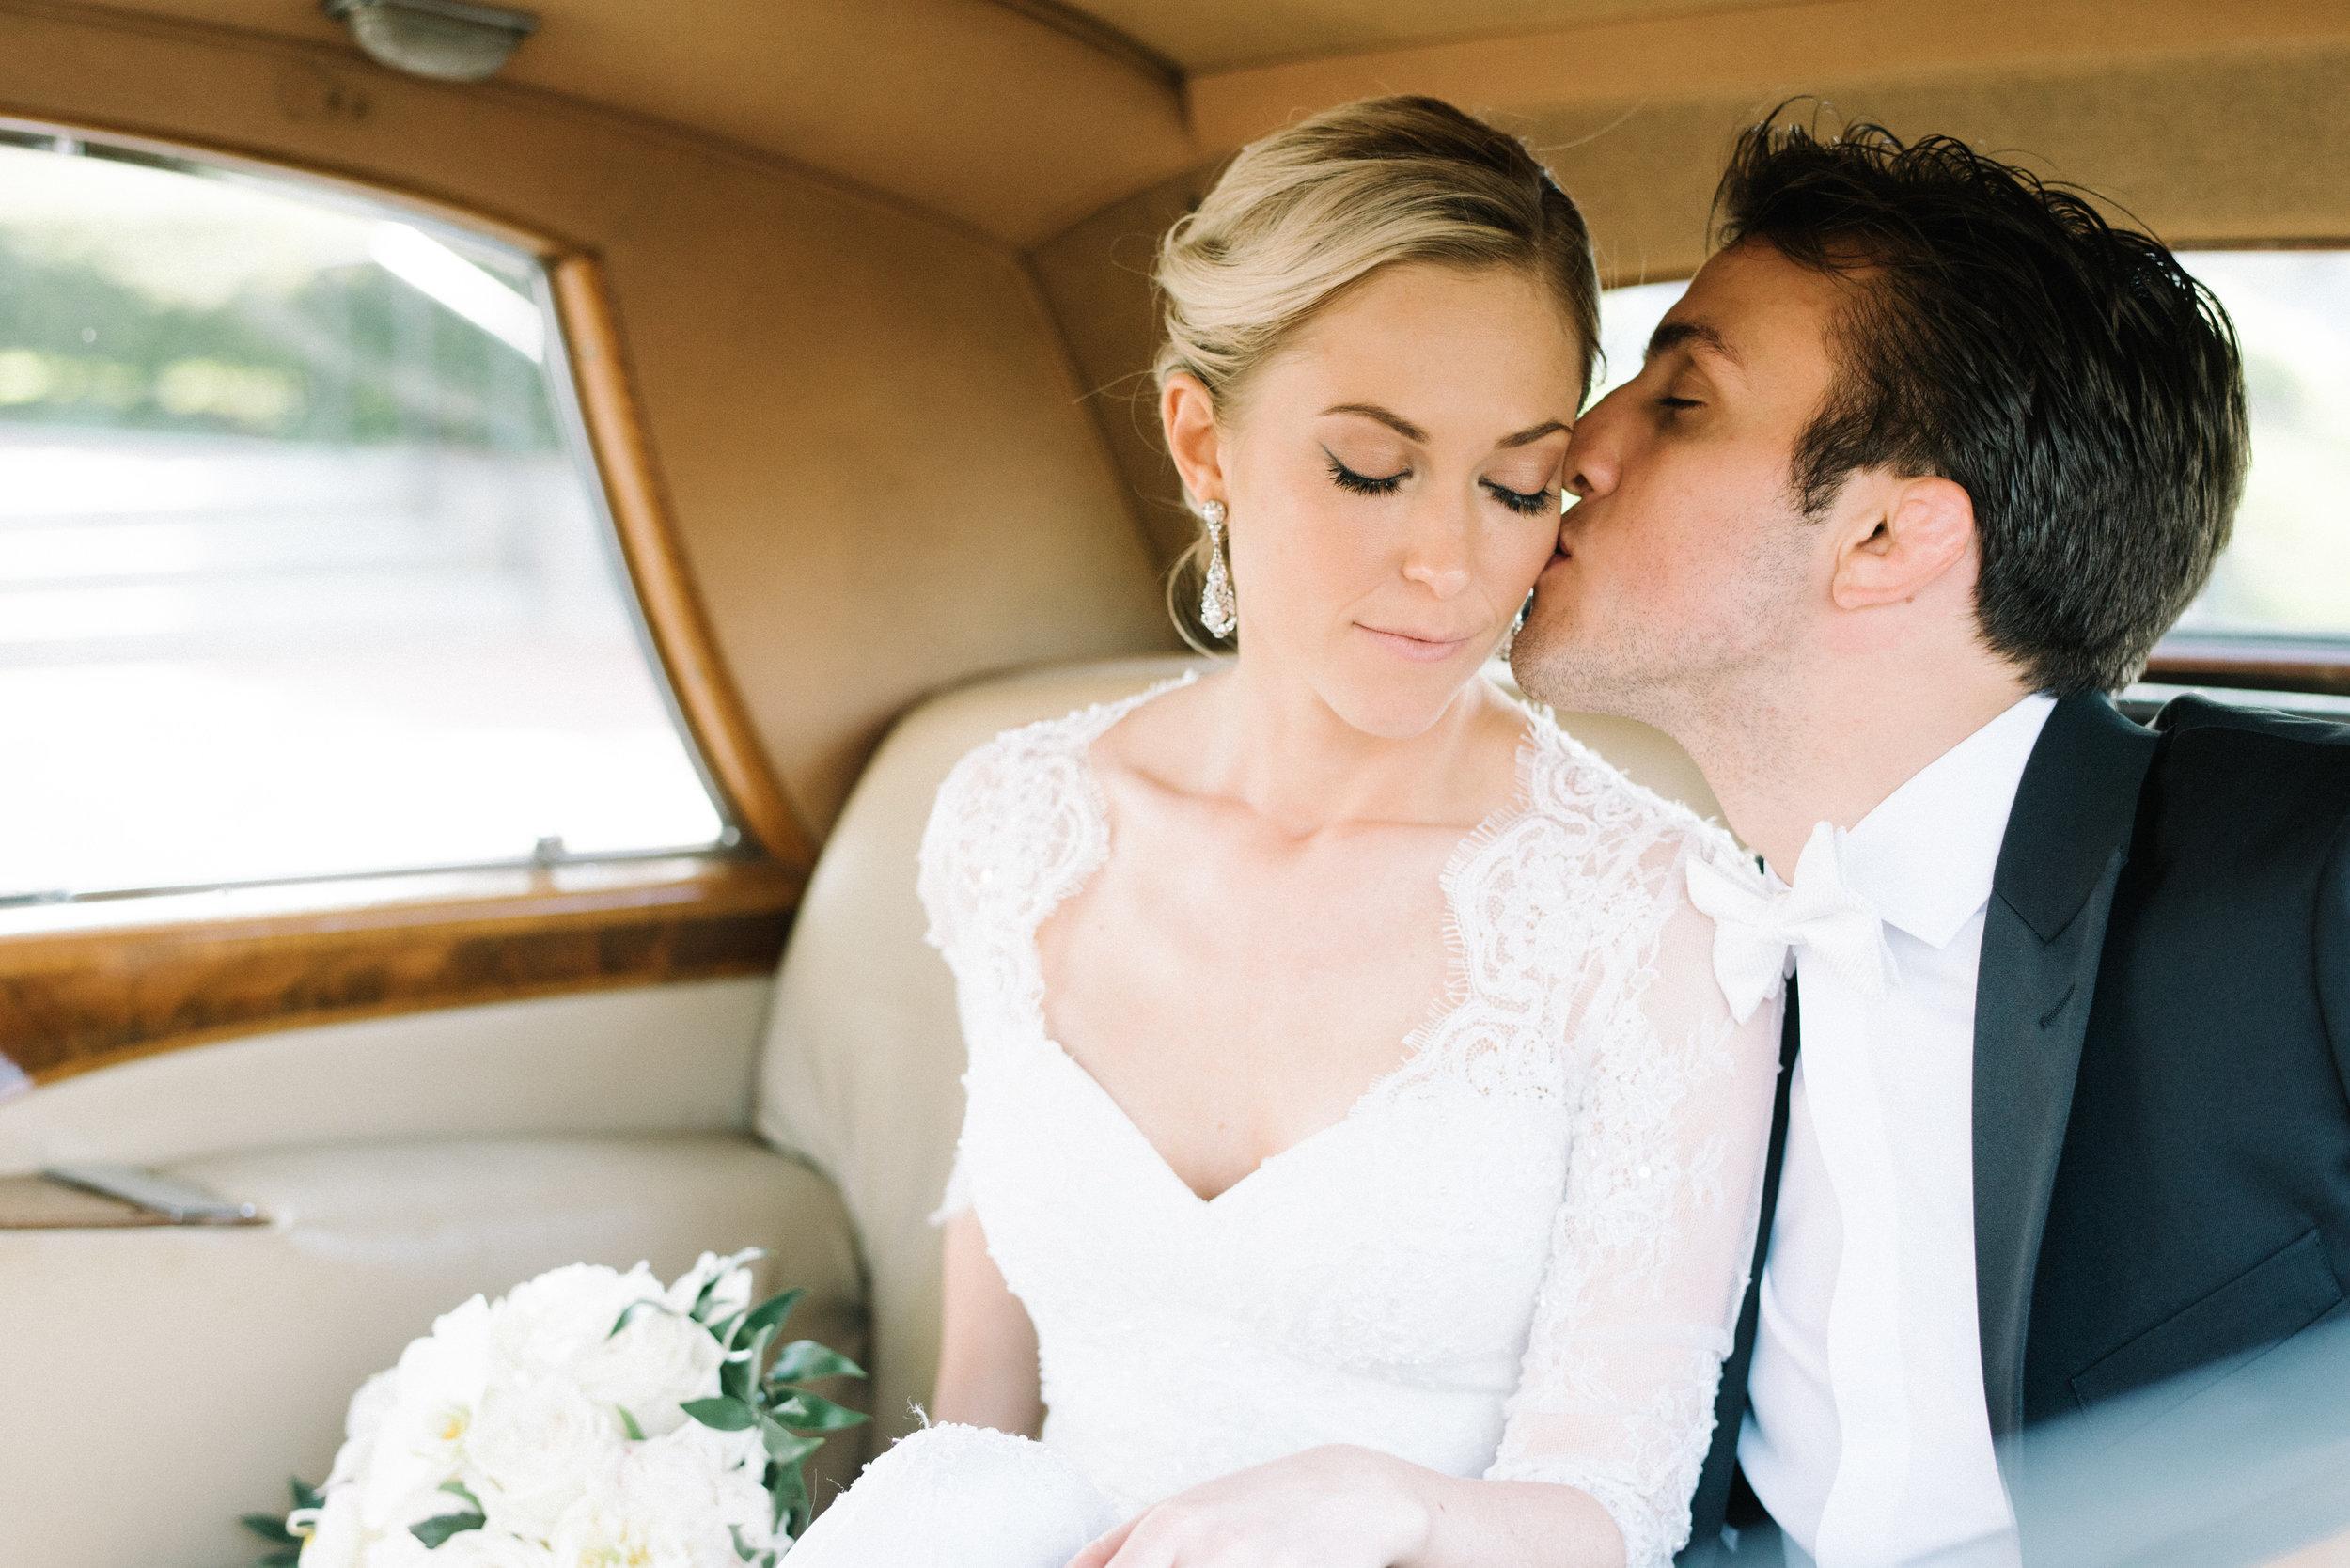 Hartnett Wedding by Michelle Lange Photography - 0340.JPG